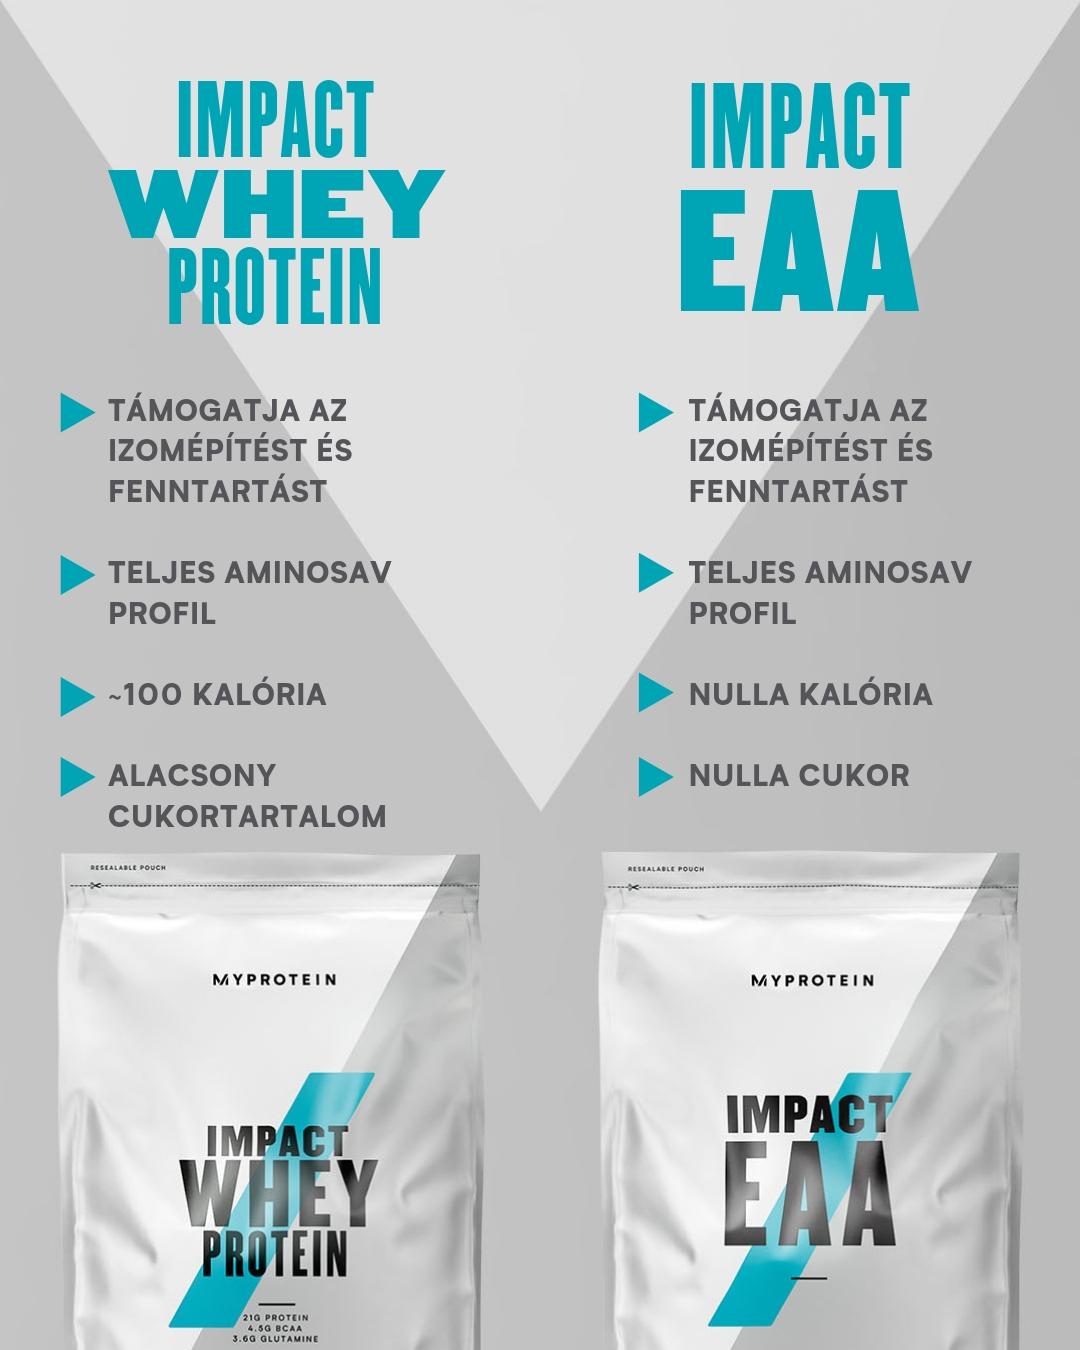 Impact EAA vs Impact Whey Protein osszehasonlitas